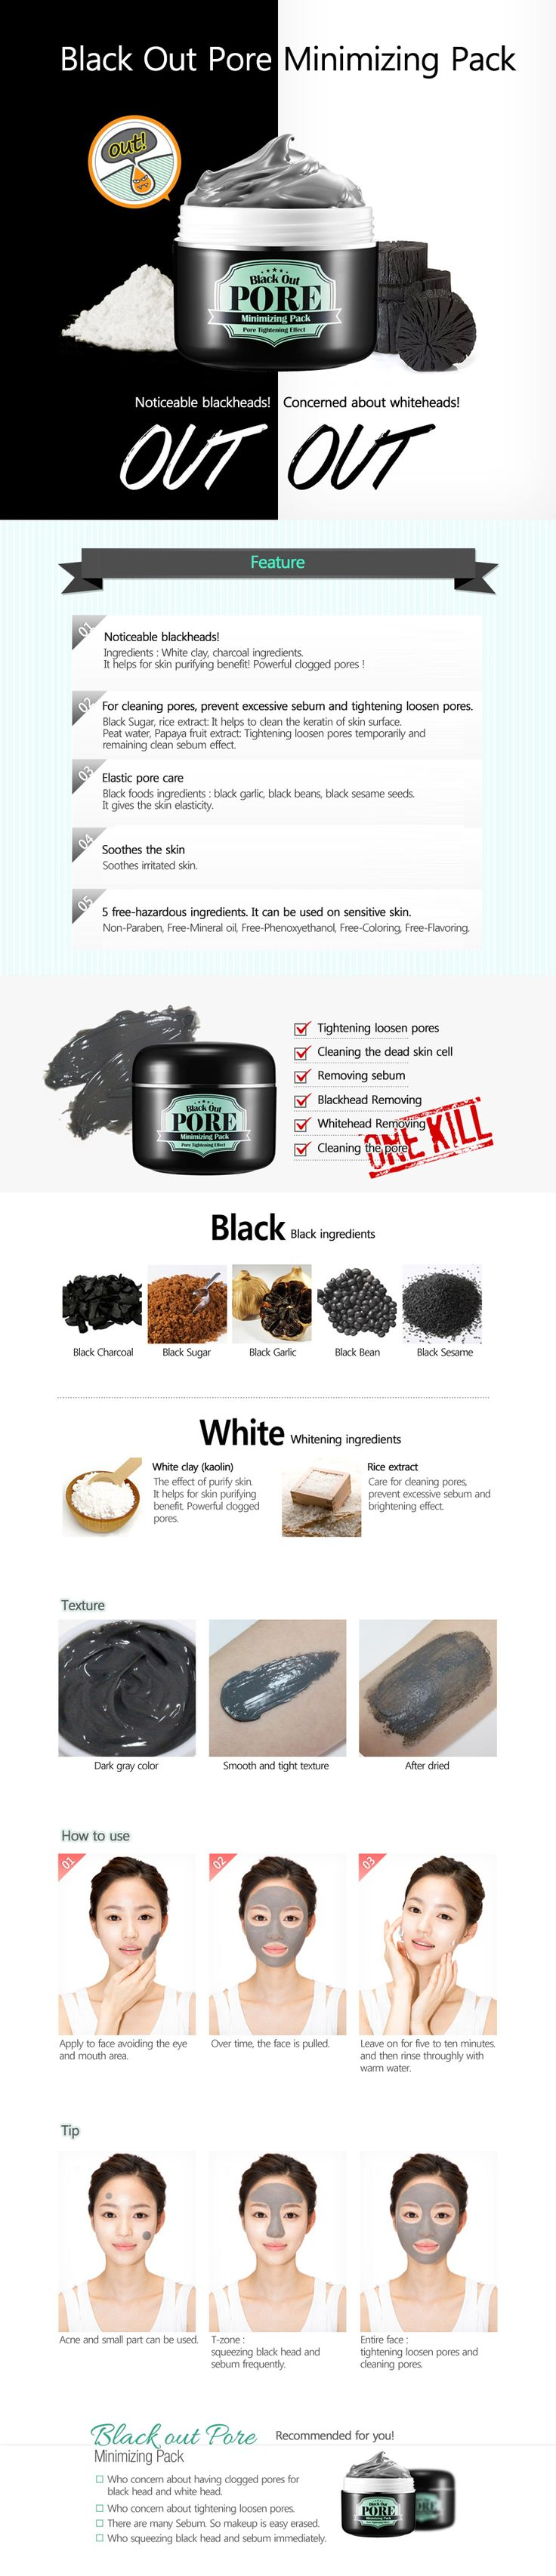 Secretkey blackout pore minimizing pack